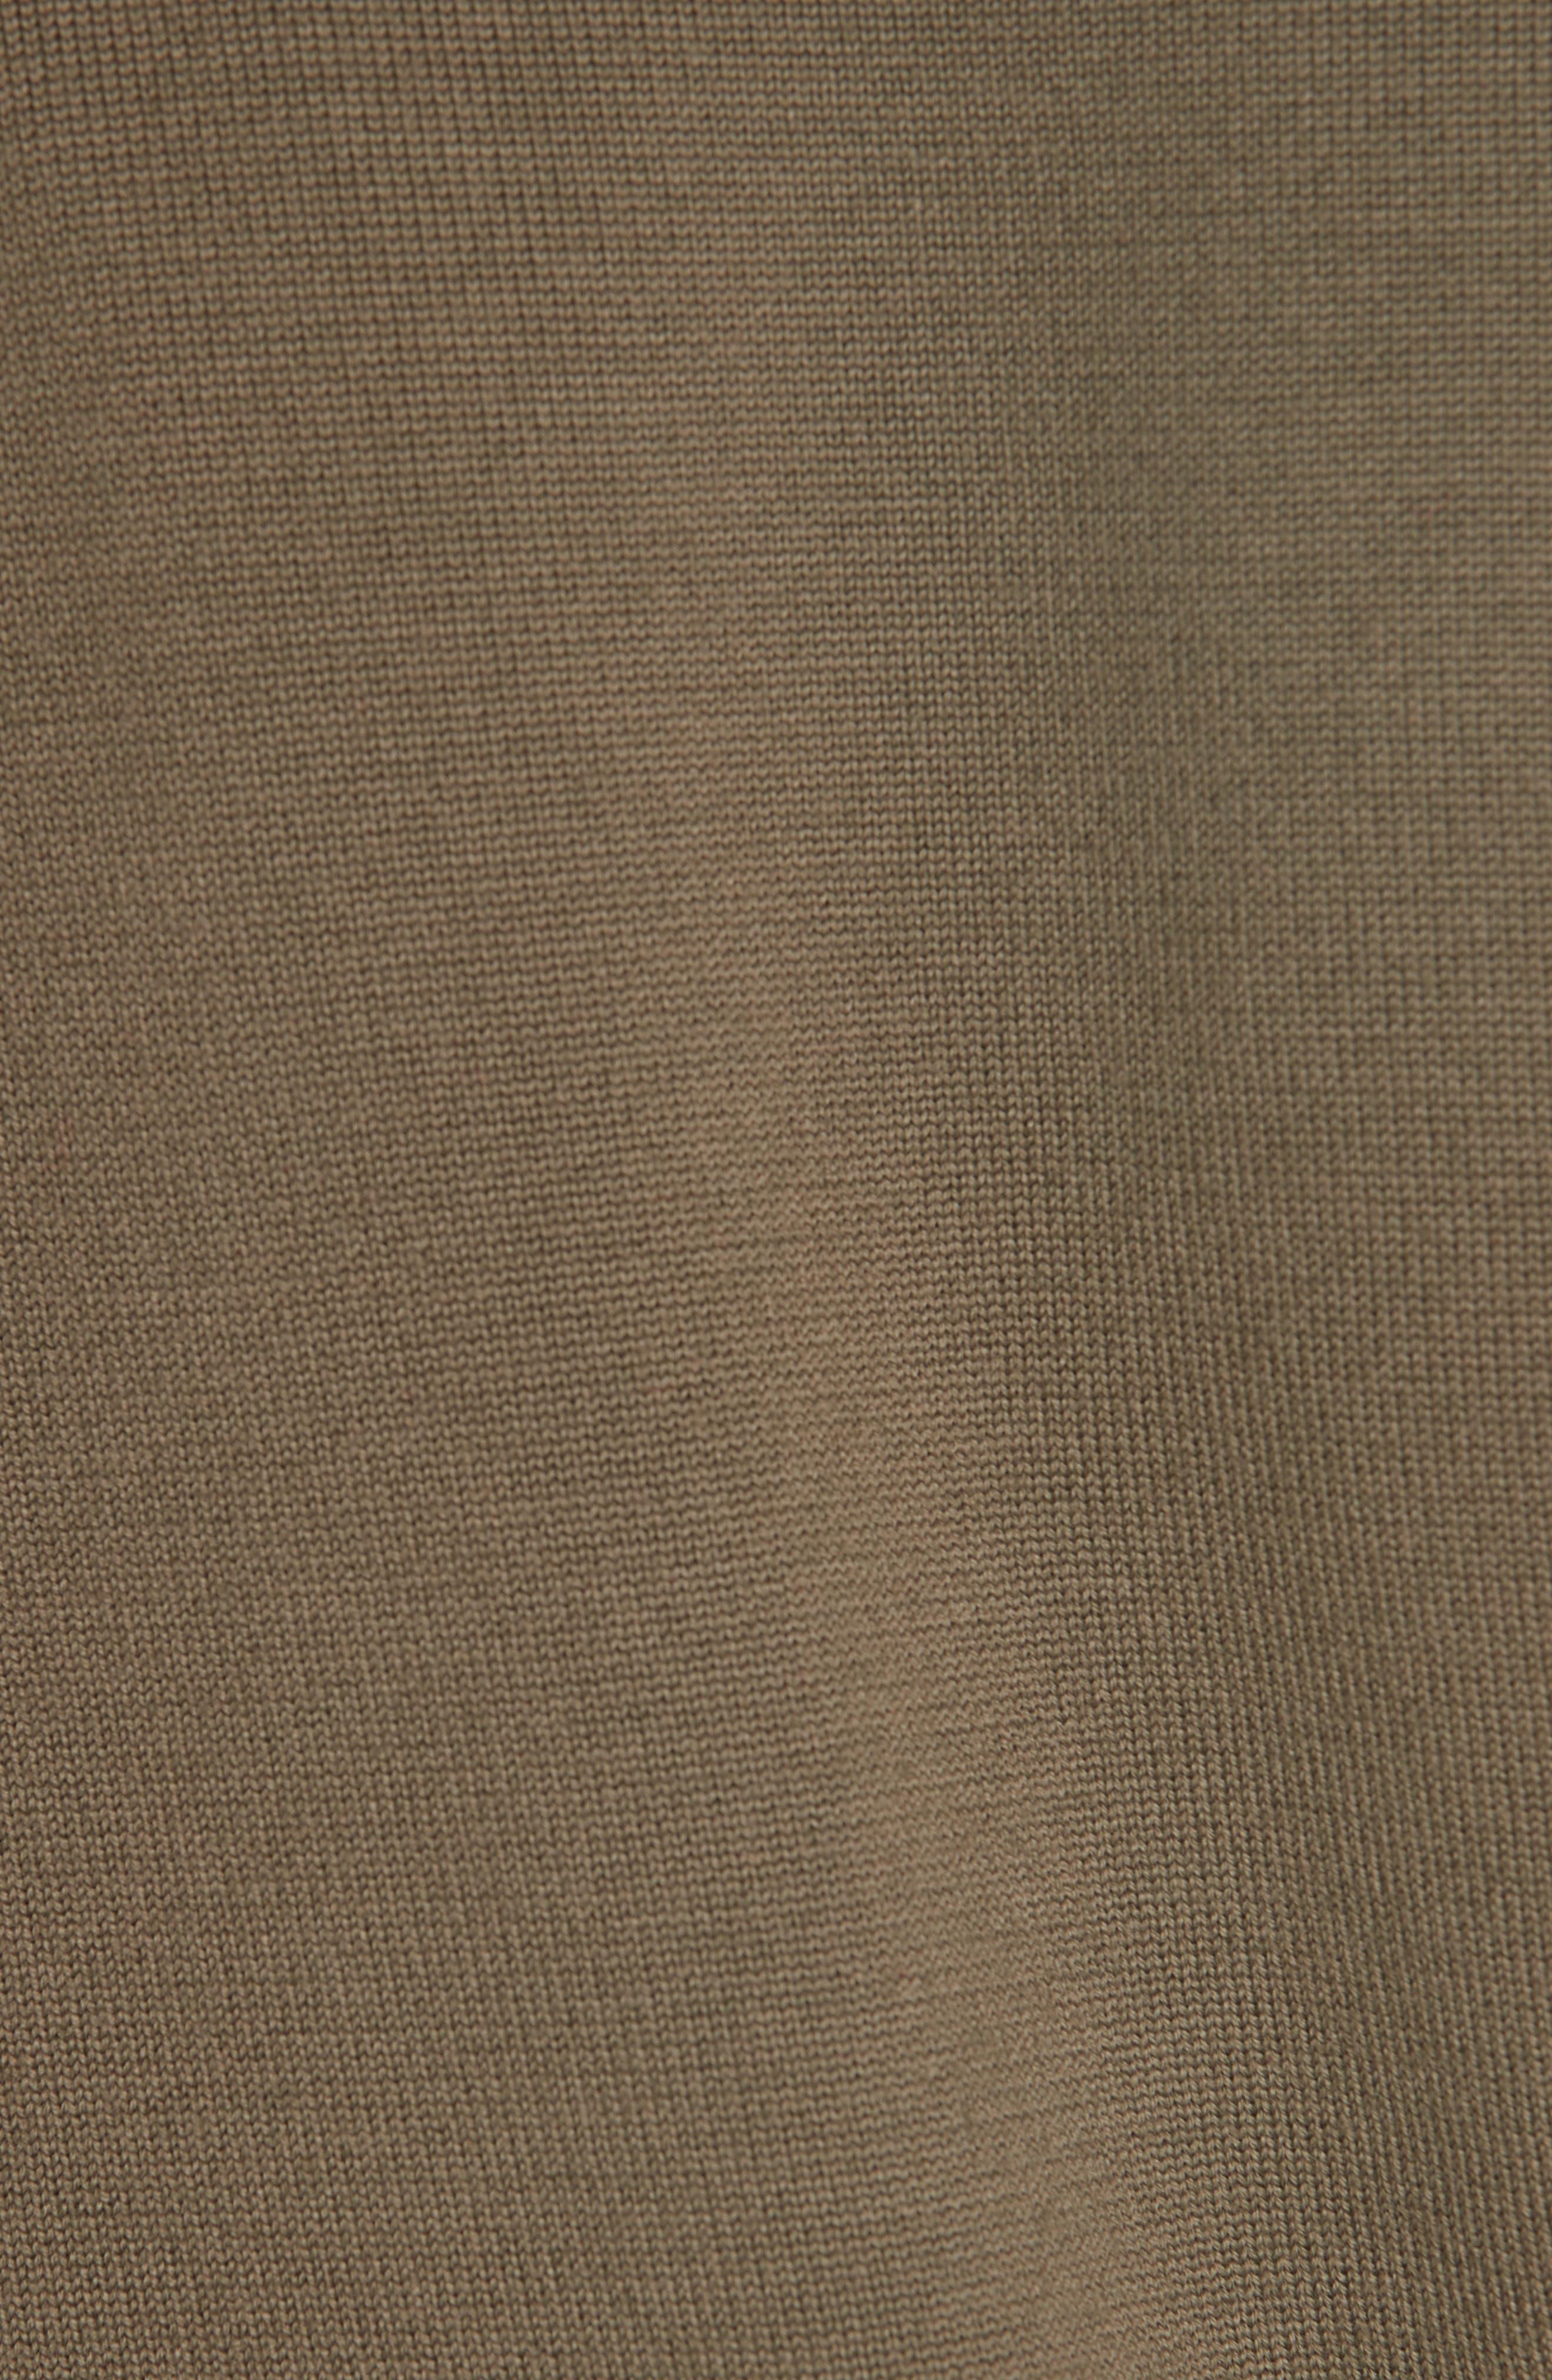 MONSE,                             Knit & Stripe Poplin Asymmetrical Dress,                             Alternate thumbnail 5, color,                             OLIVE/ WHITE